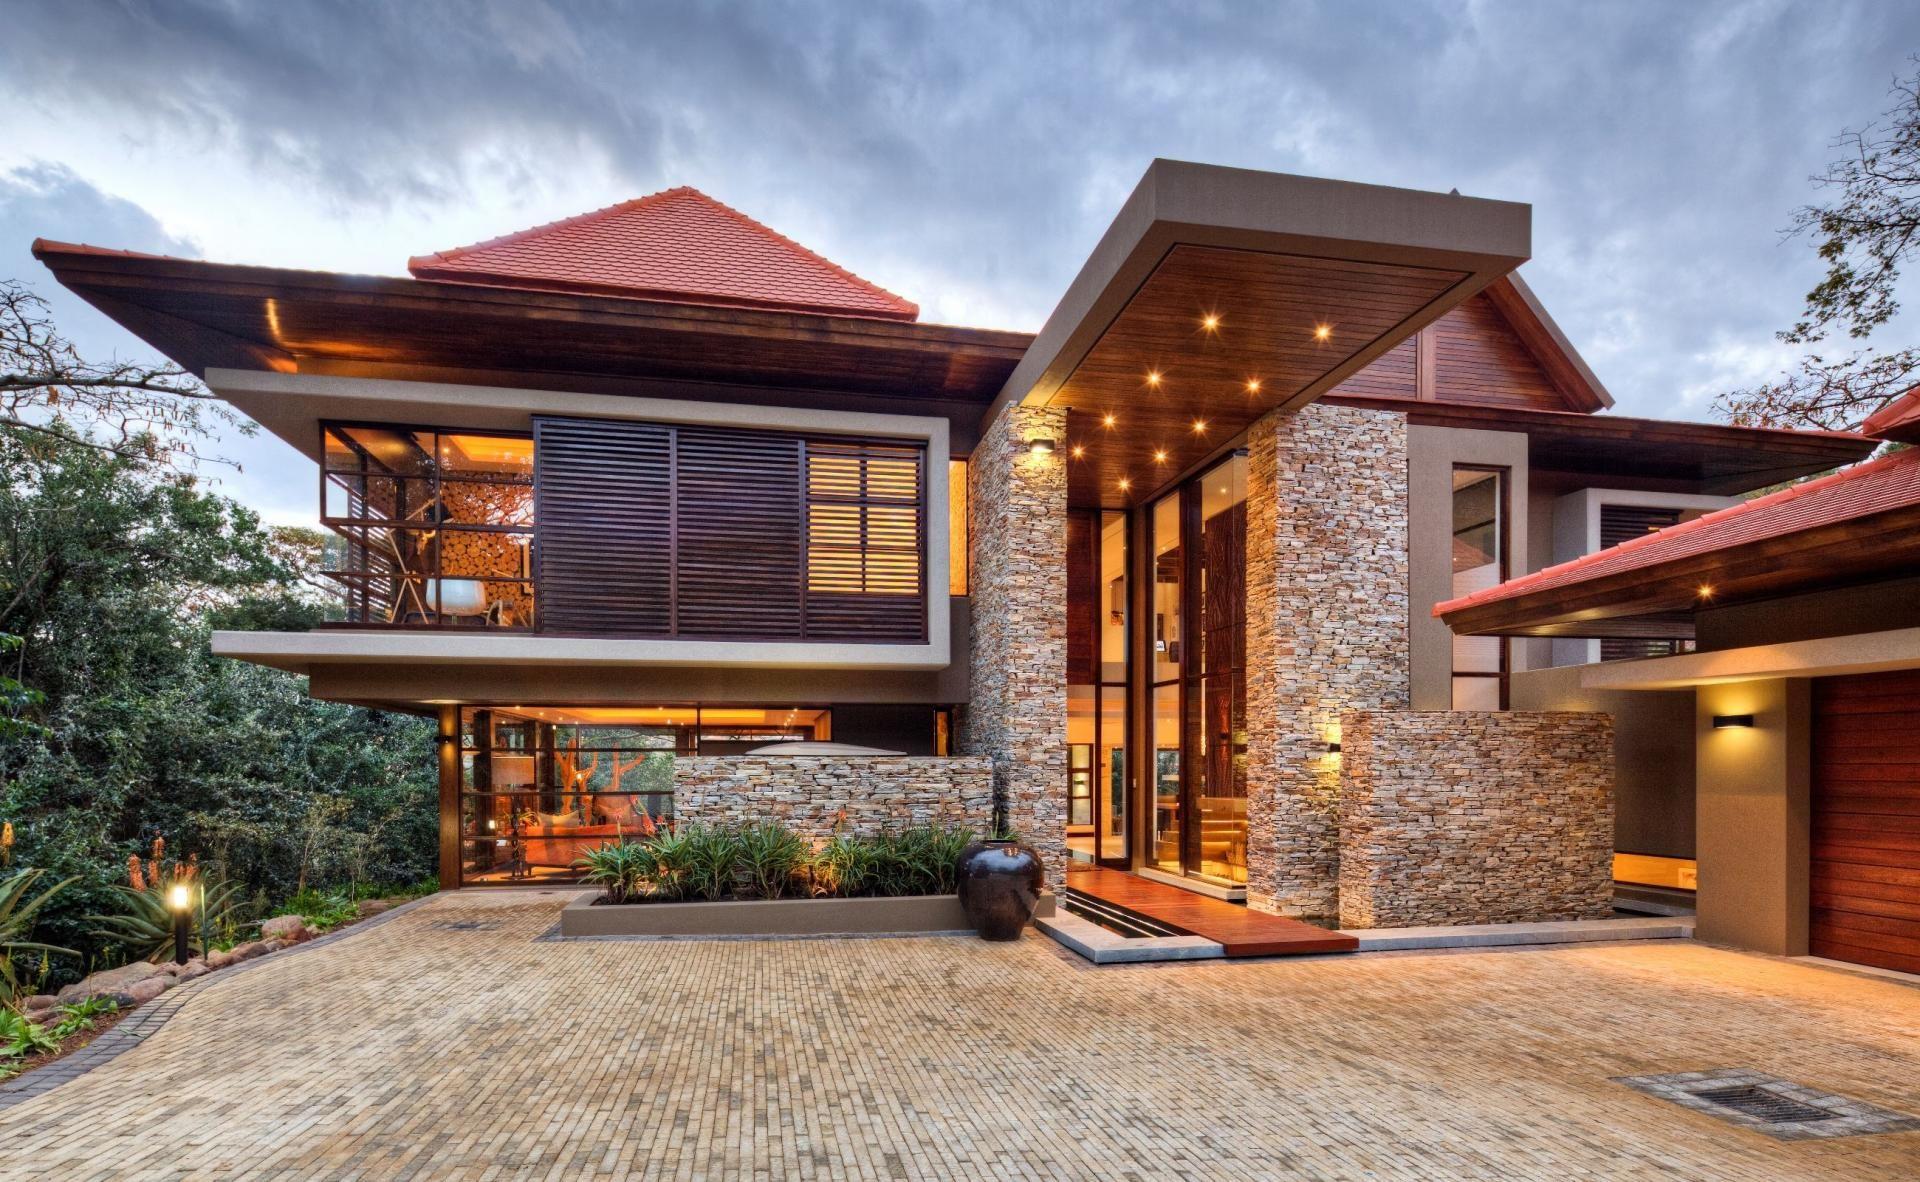 American modern house designs